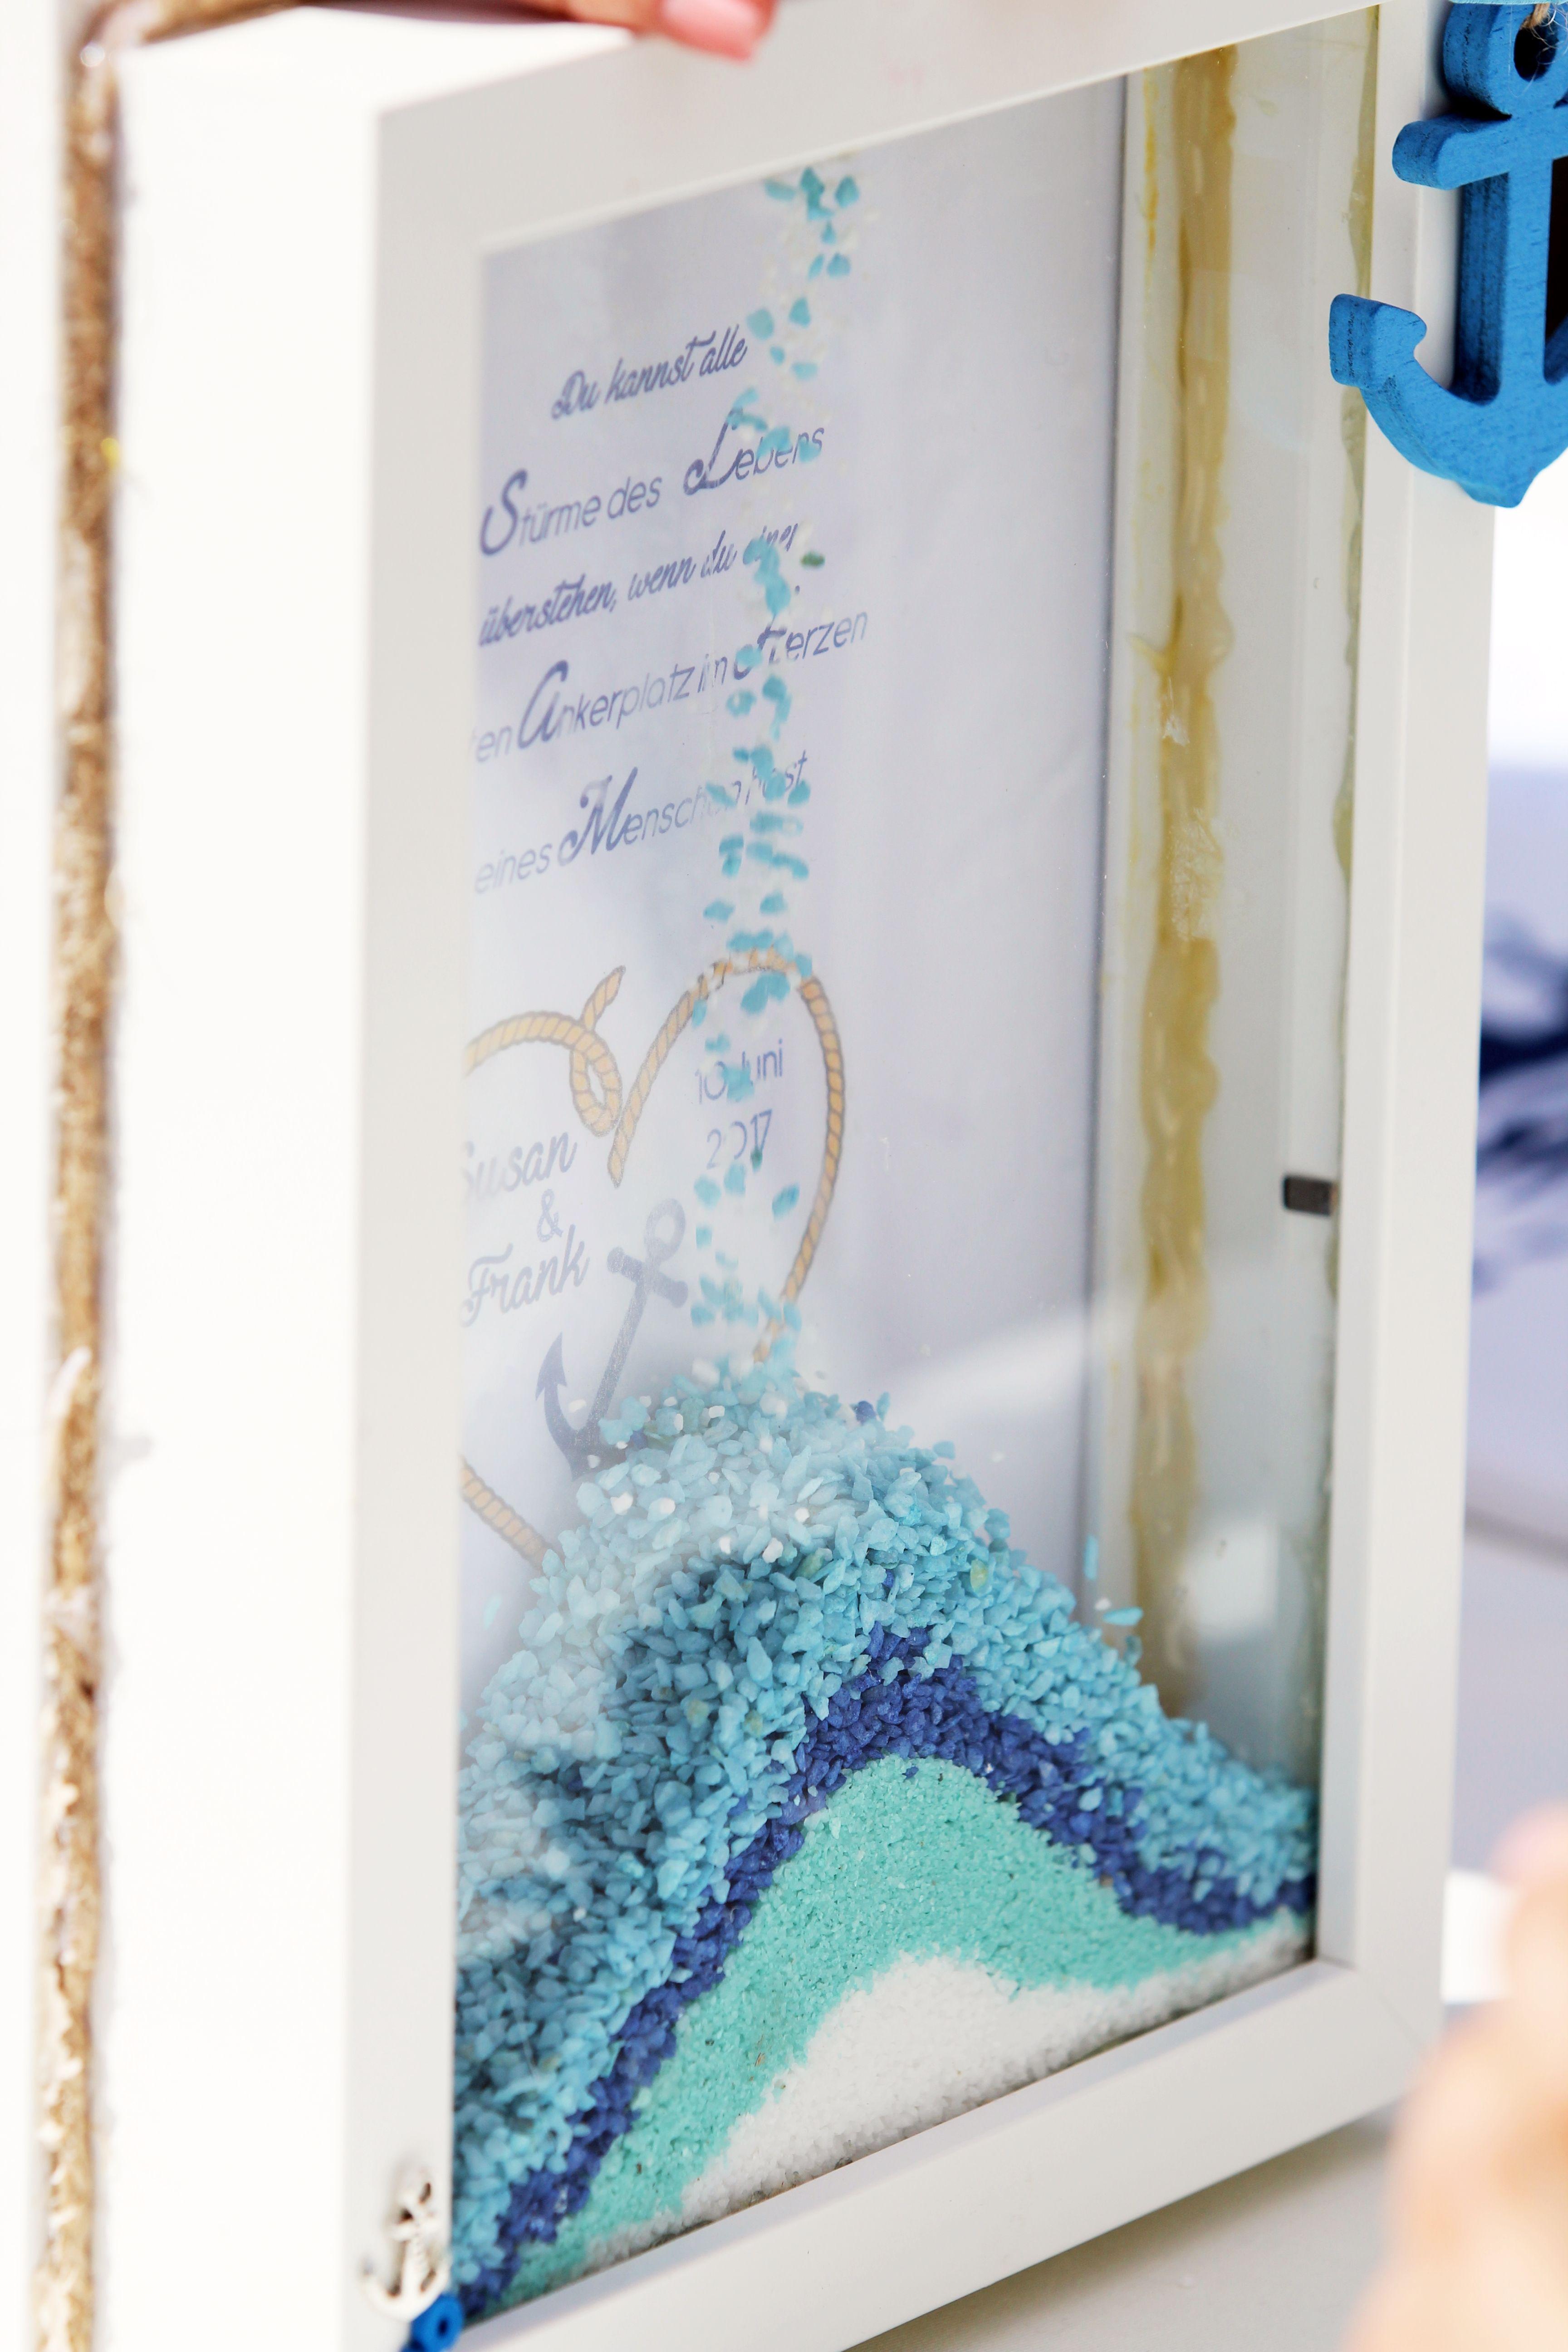 Sandritual Freie Trauung Zum Thema Maritim Deko Hochzeit Meer Zitat